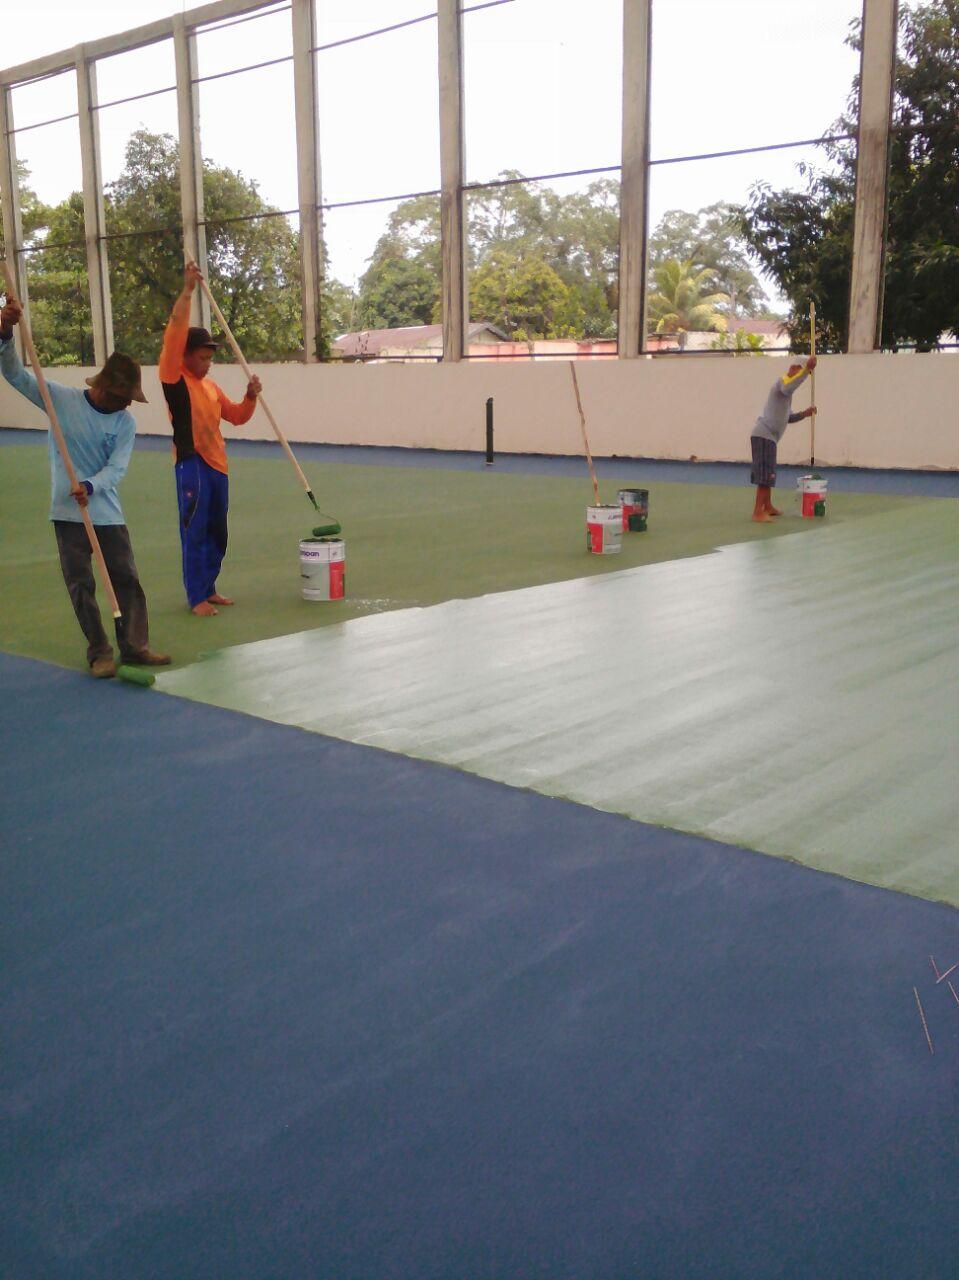 Kontraktor Lapangan Olahraga Basket Yang Melayani Seluruh Wilayah Indonesia